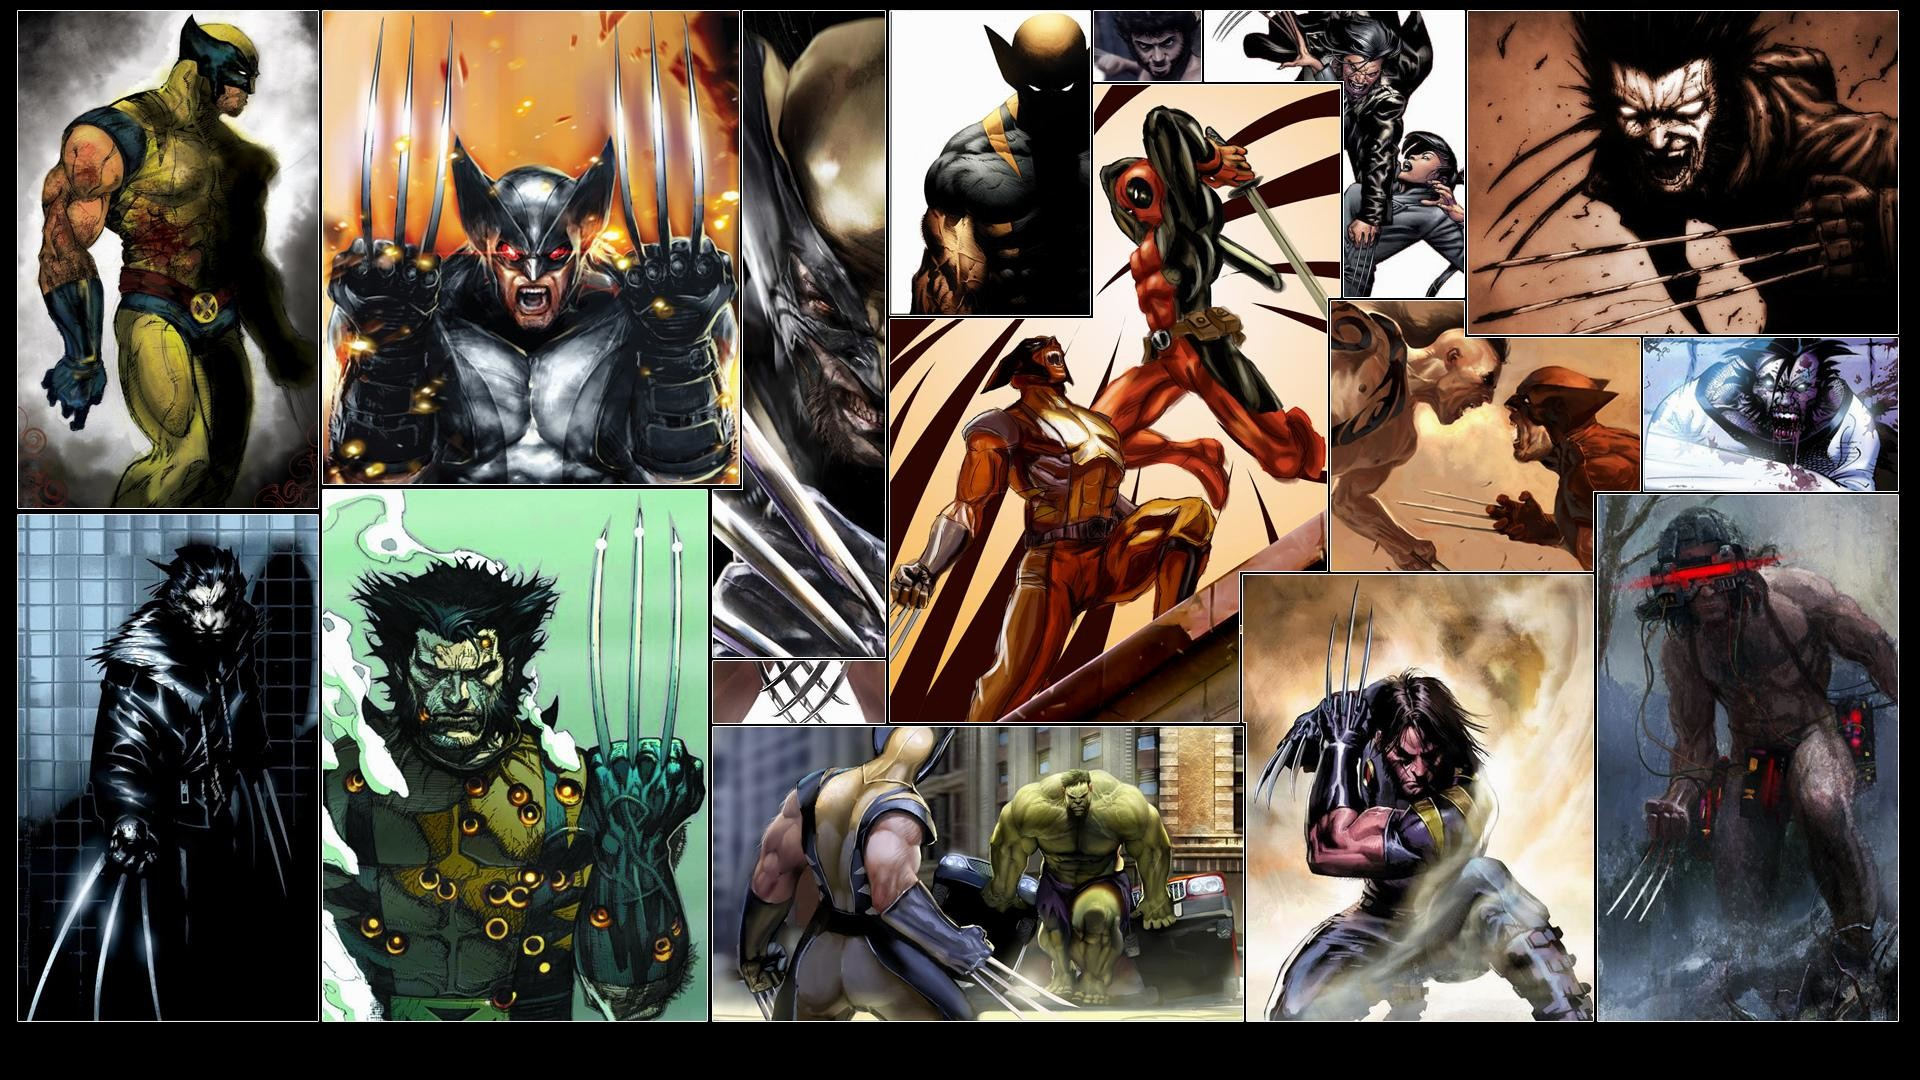 Comics-Wolverine-Deadpool-Hulk-wallpaper-wp4004579